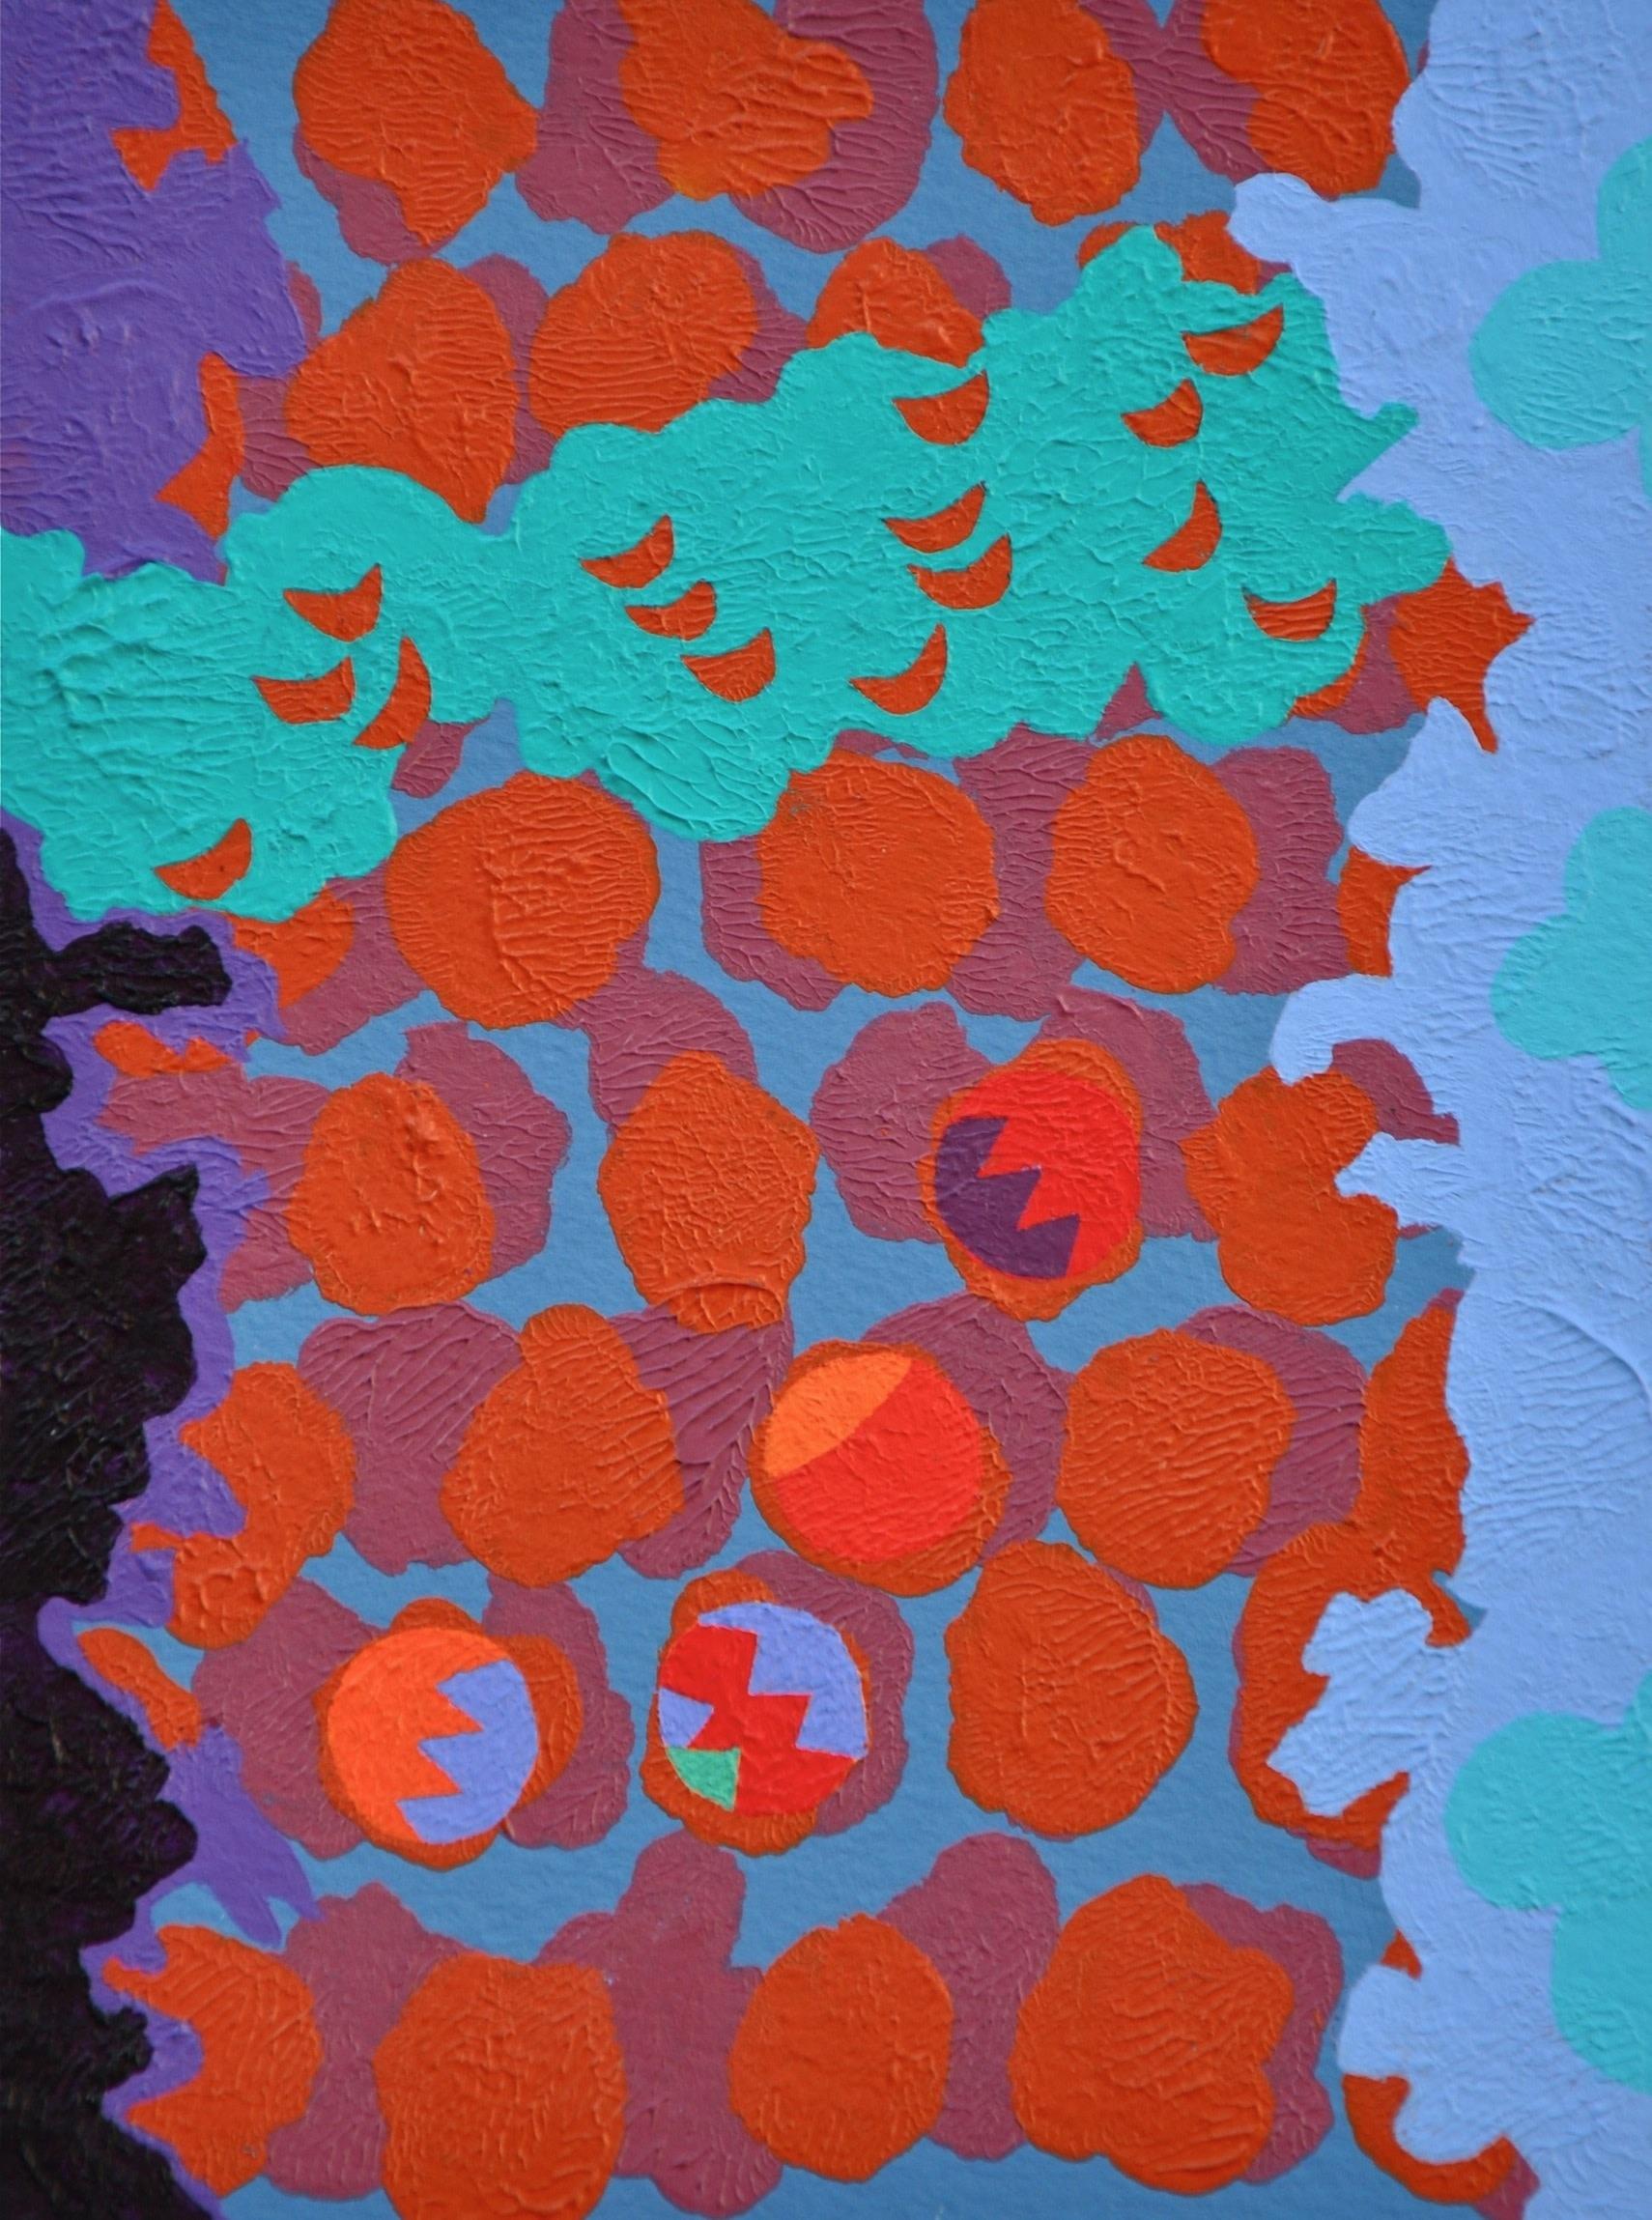 <span class=&#34;link fancybox-details-link&#34;><a href=&#34;/exhibitions/24/works/artworks_standalone10703/&#34;>View Detail Page</a></span><div class=&#34;artist&#34;><span class=&#34;artist&#34;><strong>John Crossley</strong></span></div><div class=&#34;title&#34;><em>Tumble</em></div><div class=&#34;medium&#34;>acrylic</div><div class=&#34;dimensions&#34;>29 x 24cm</div>